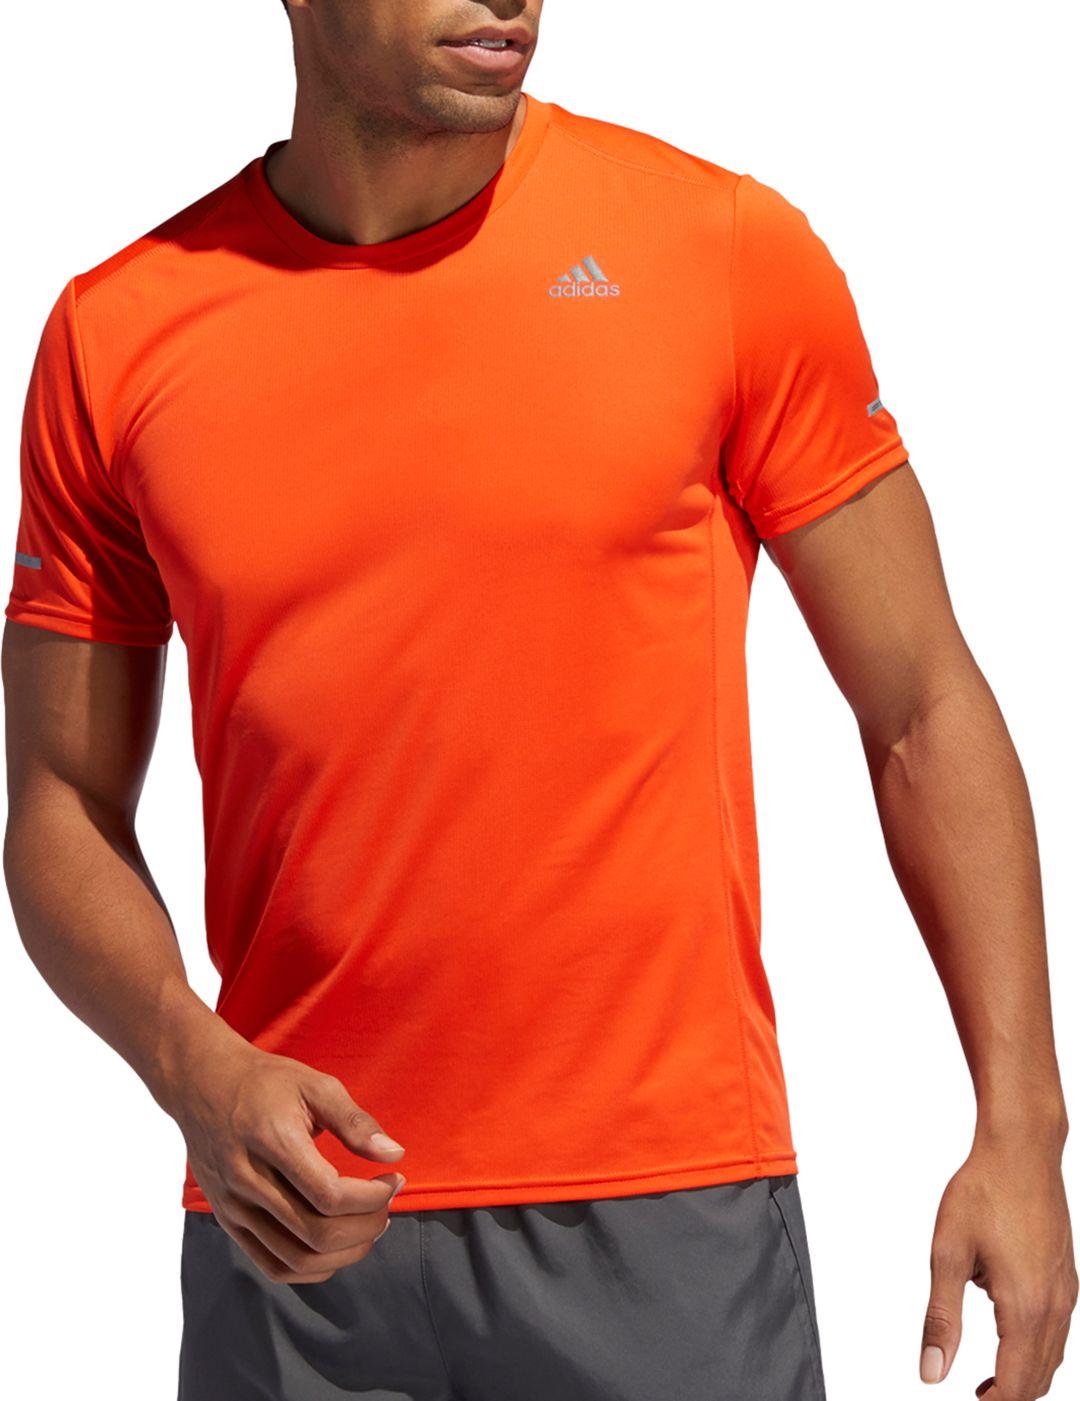 cca6e9e548ed adidas Men's Response Running T-Shirt